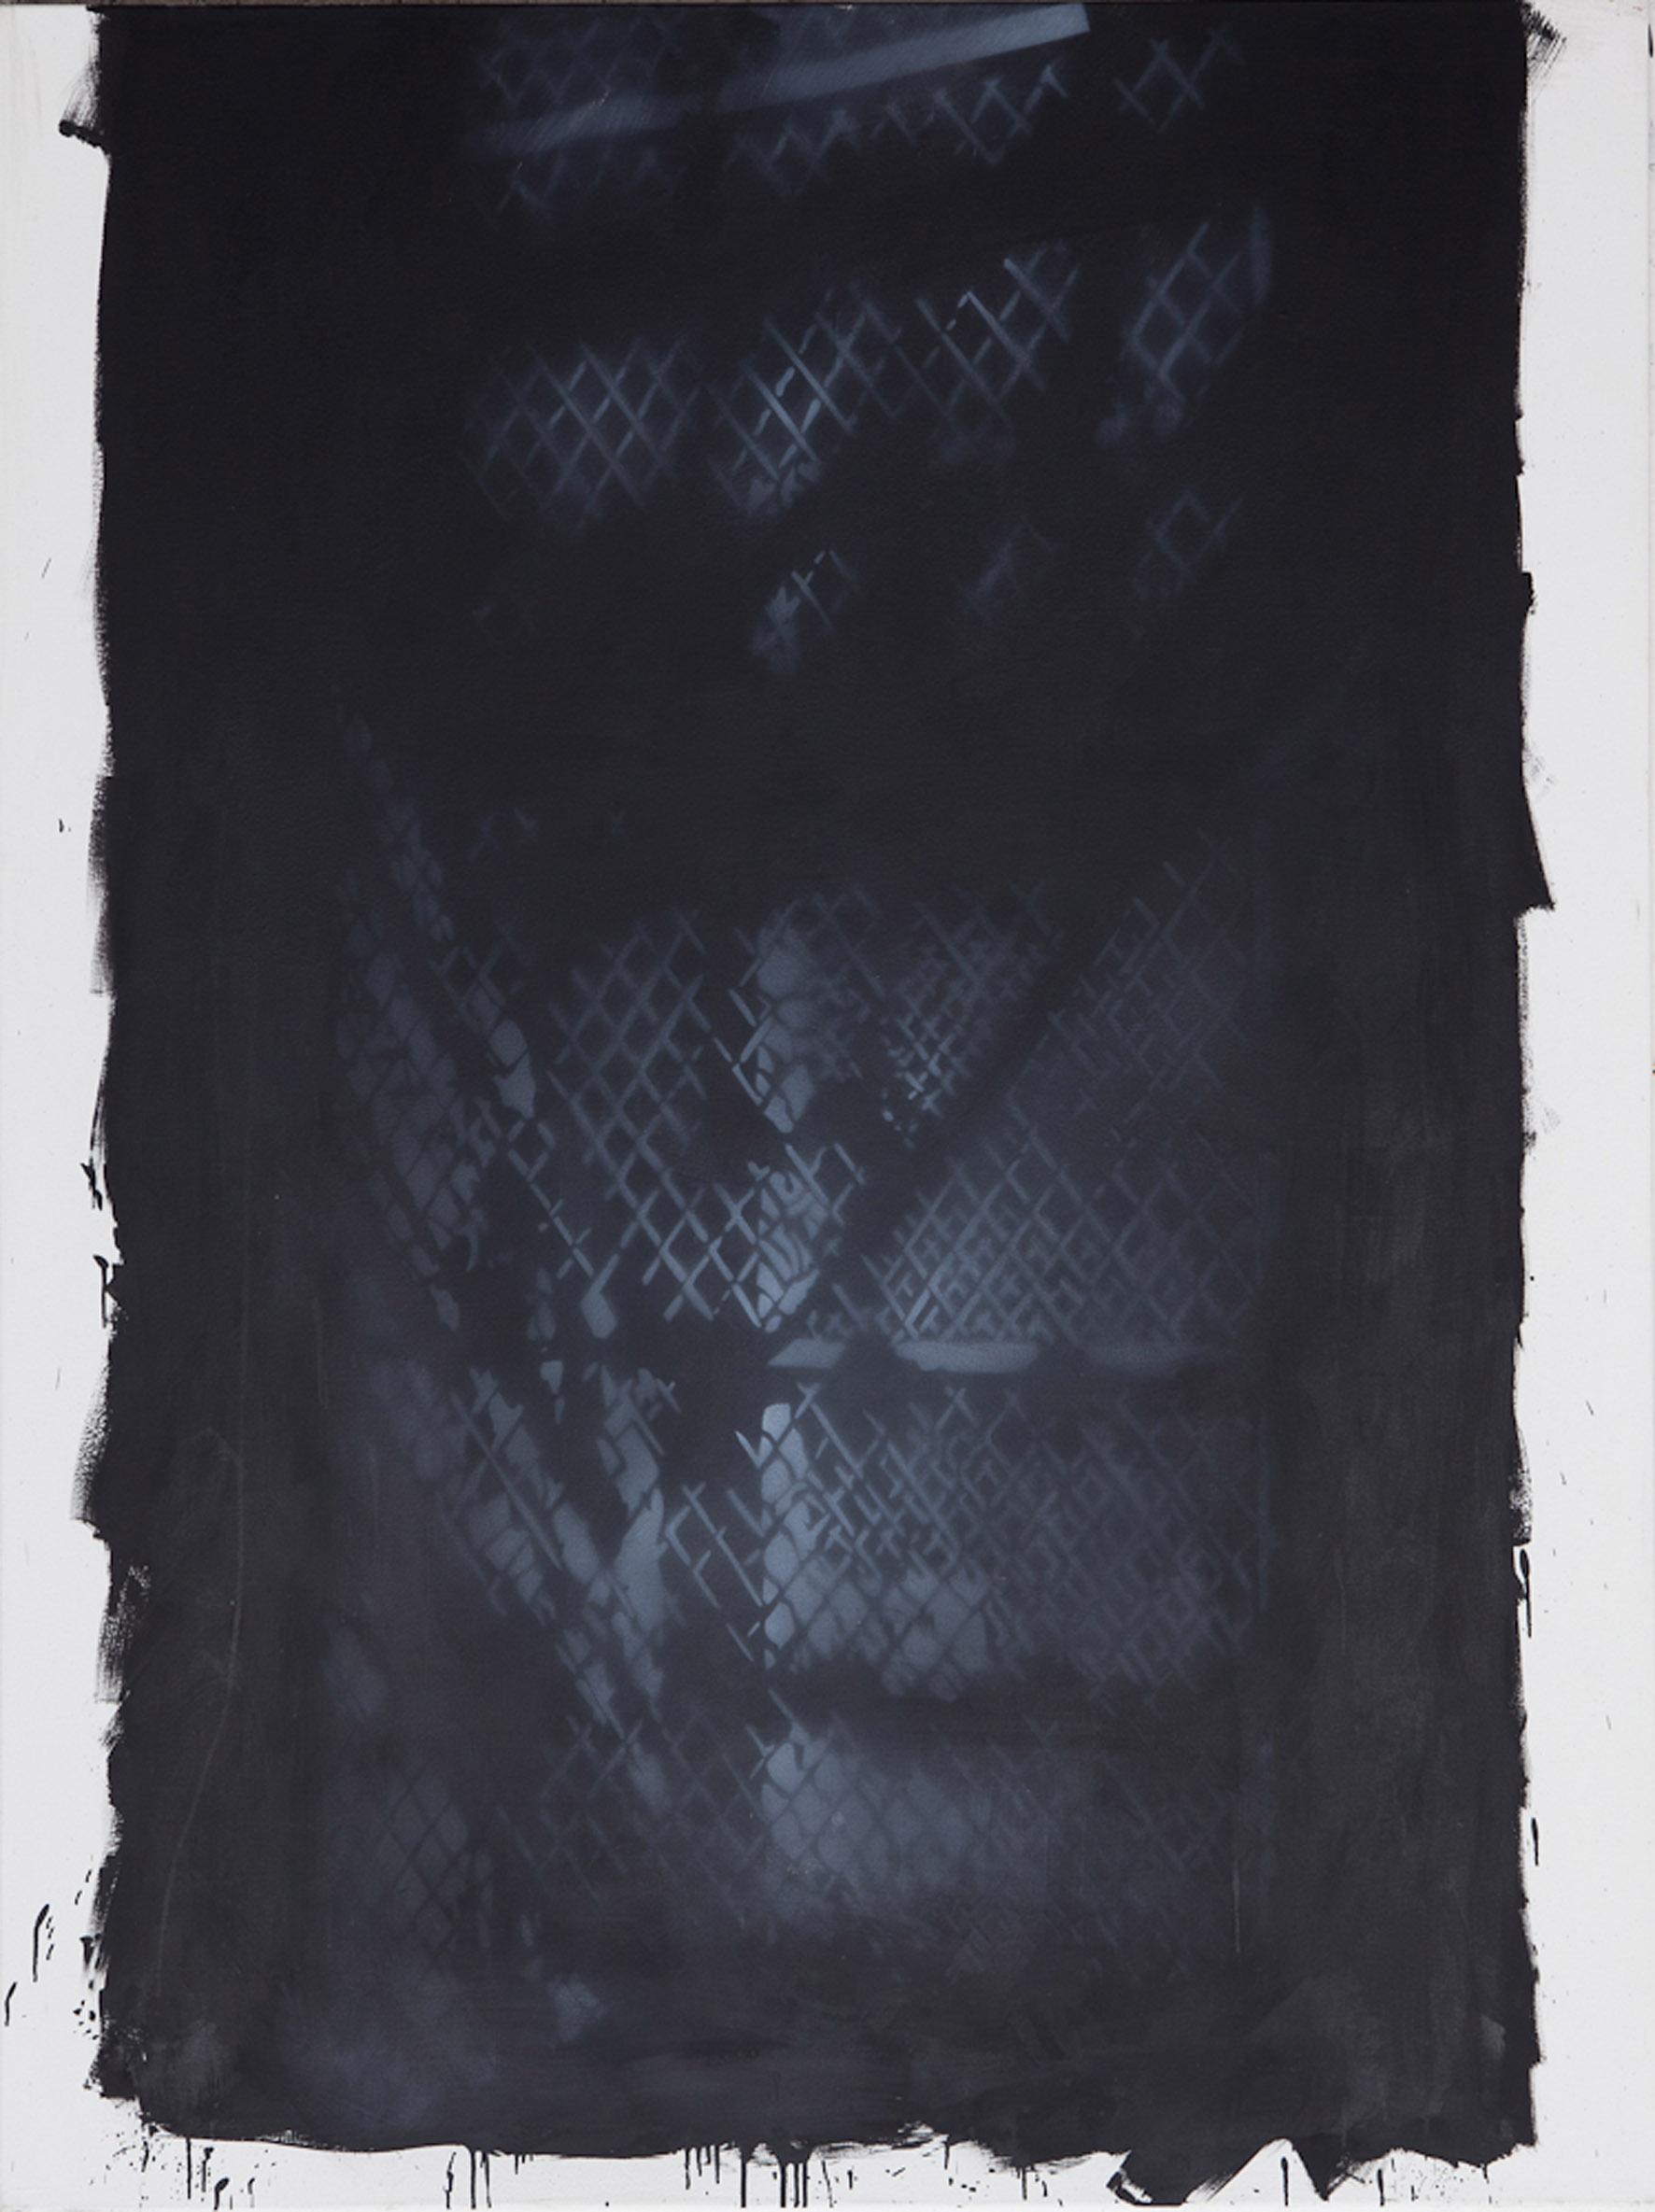 Illusion or fiction II, 2013